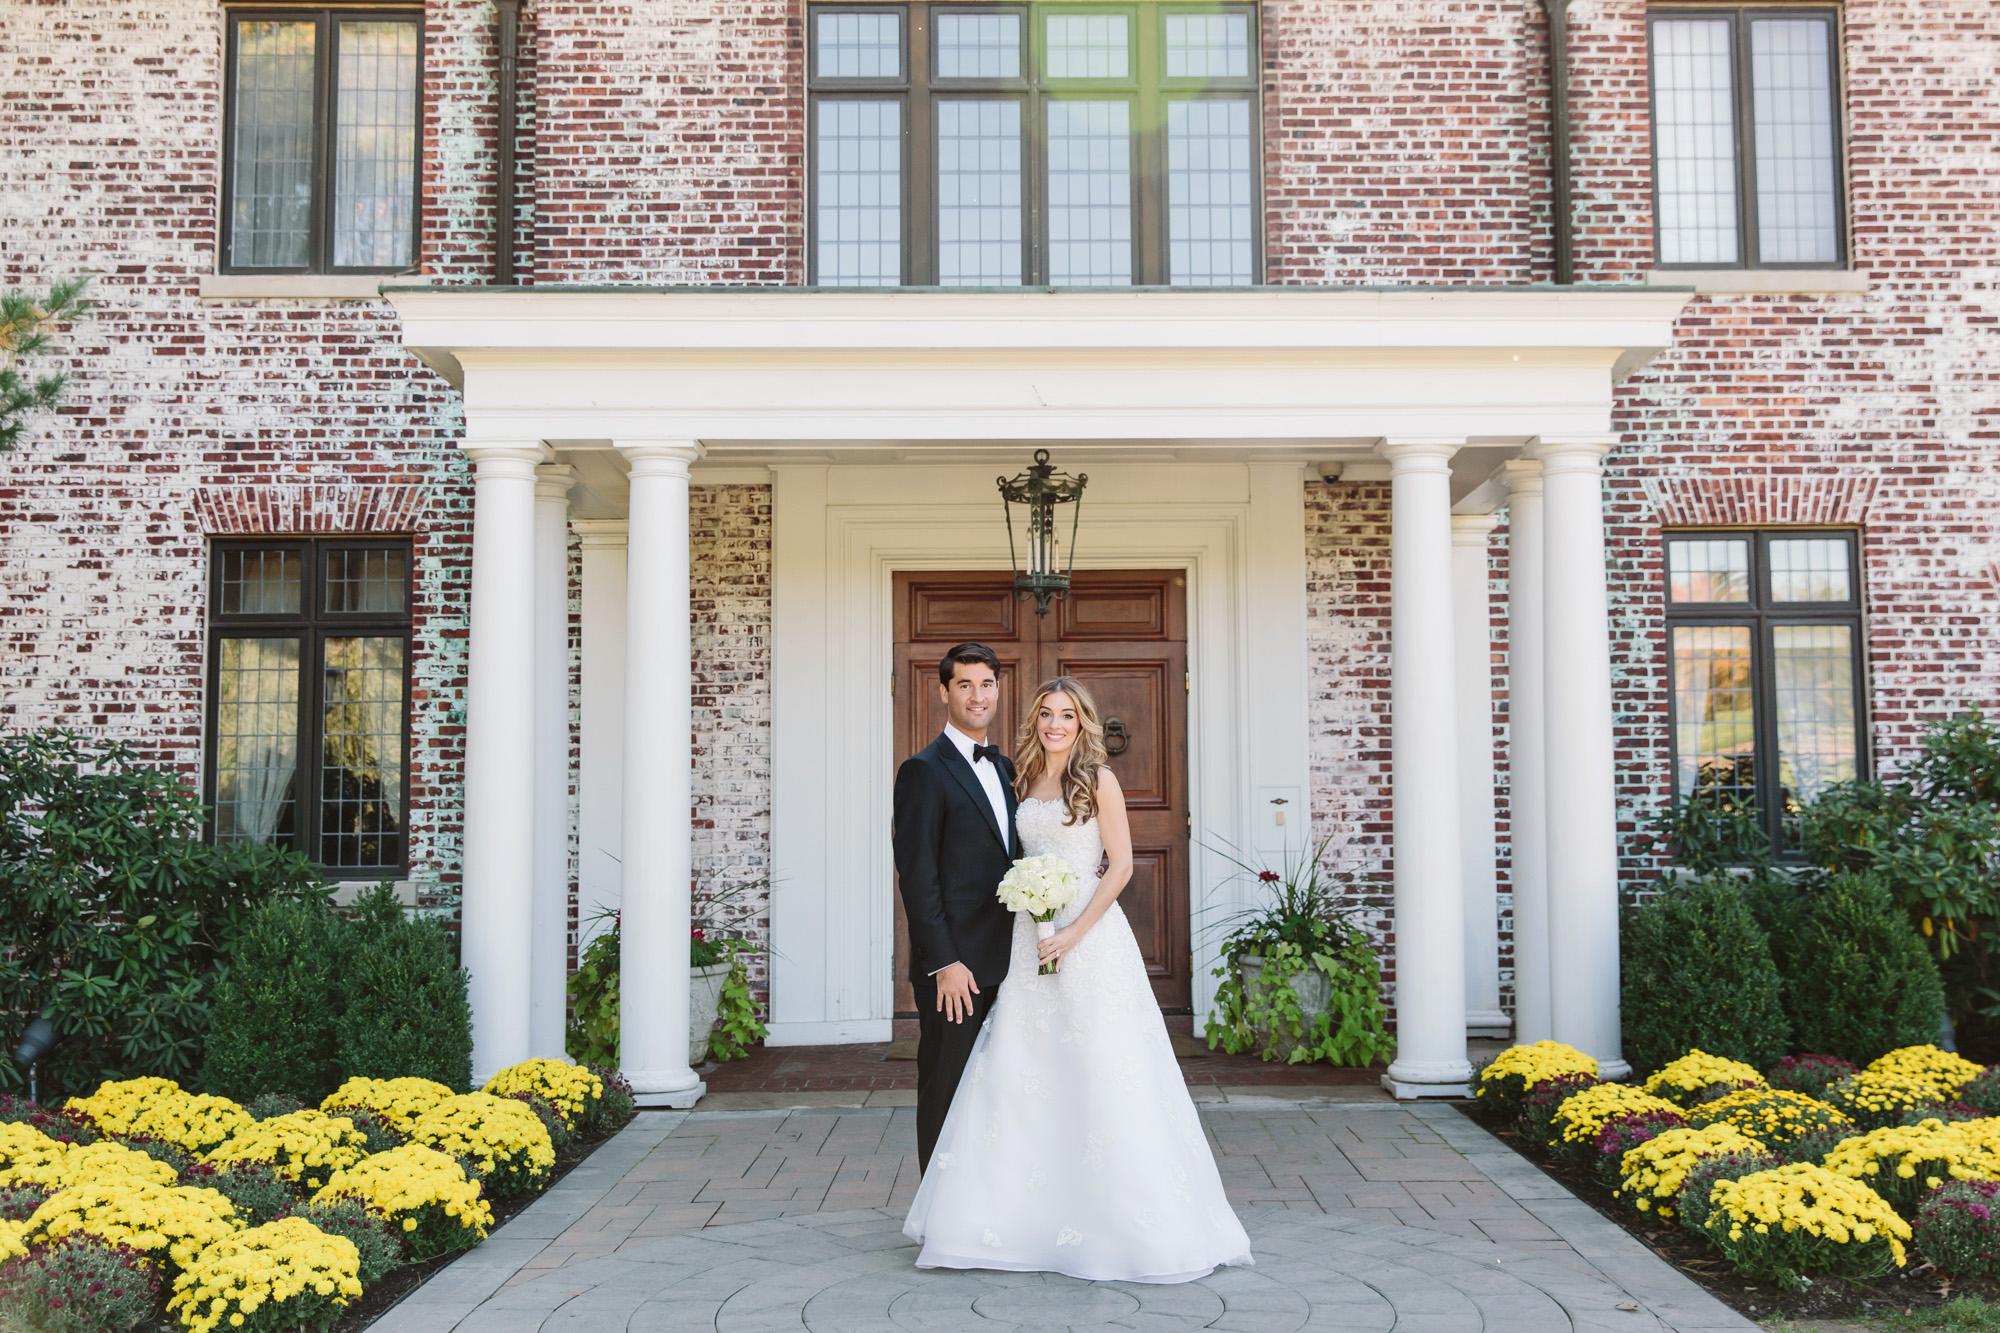 24_Christina_Daniel_Hamilton_Farm_Golf_Club_Wedding_NJ_Tanya_Salazar_Photography_243.jpg